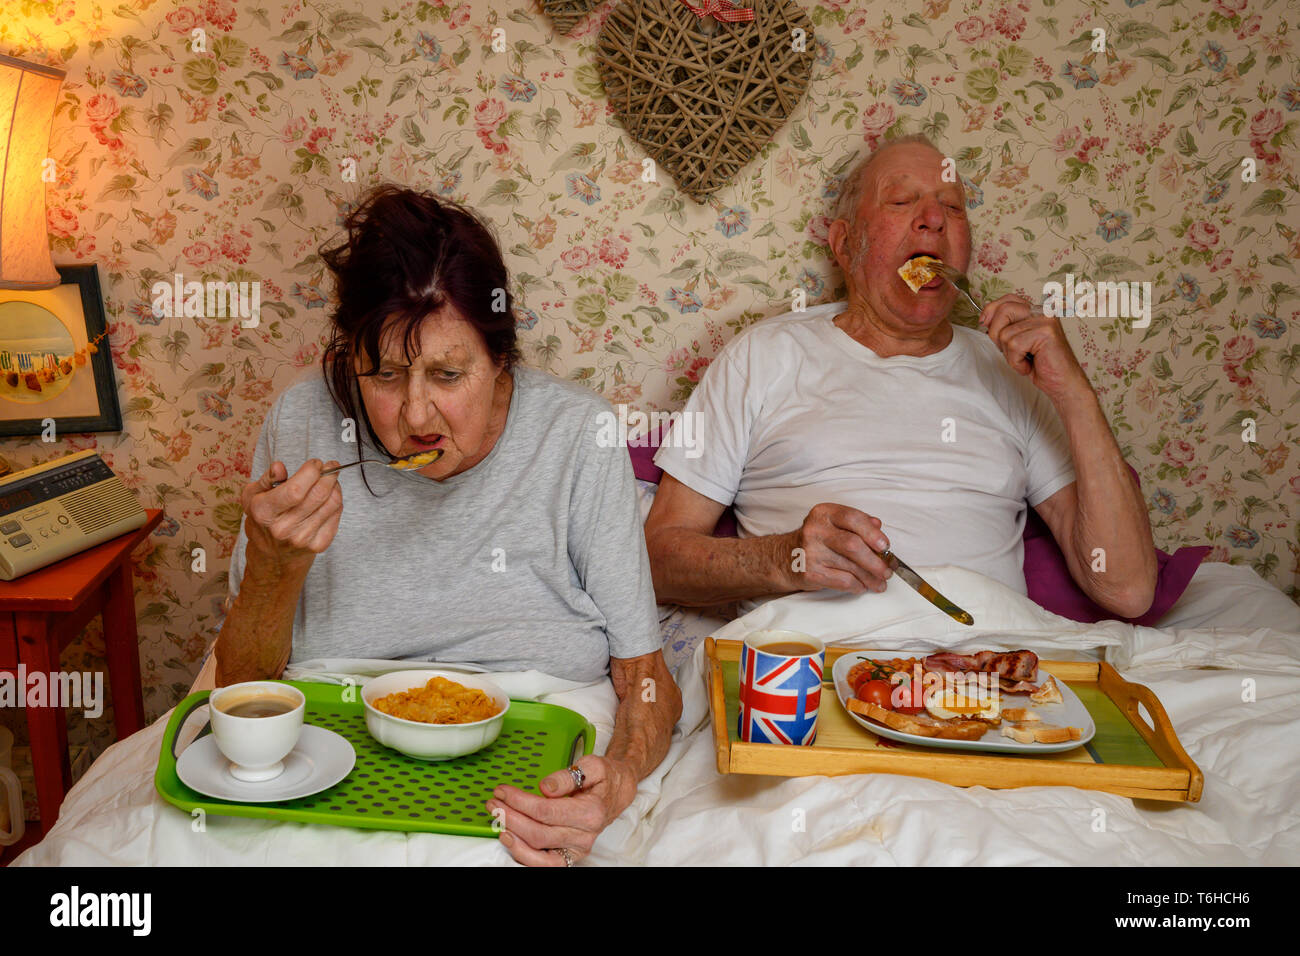 Elderly couple eating breakfast in bed - Stock Image